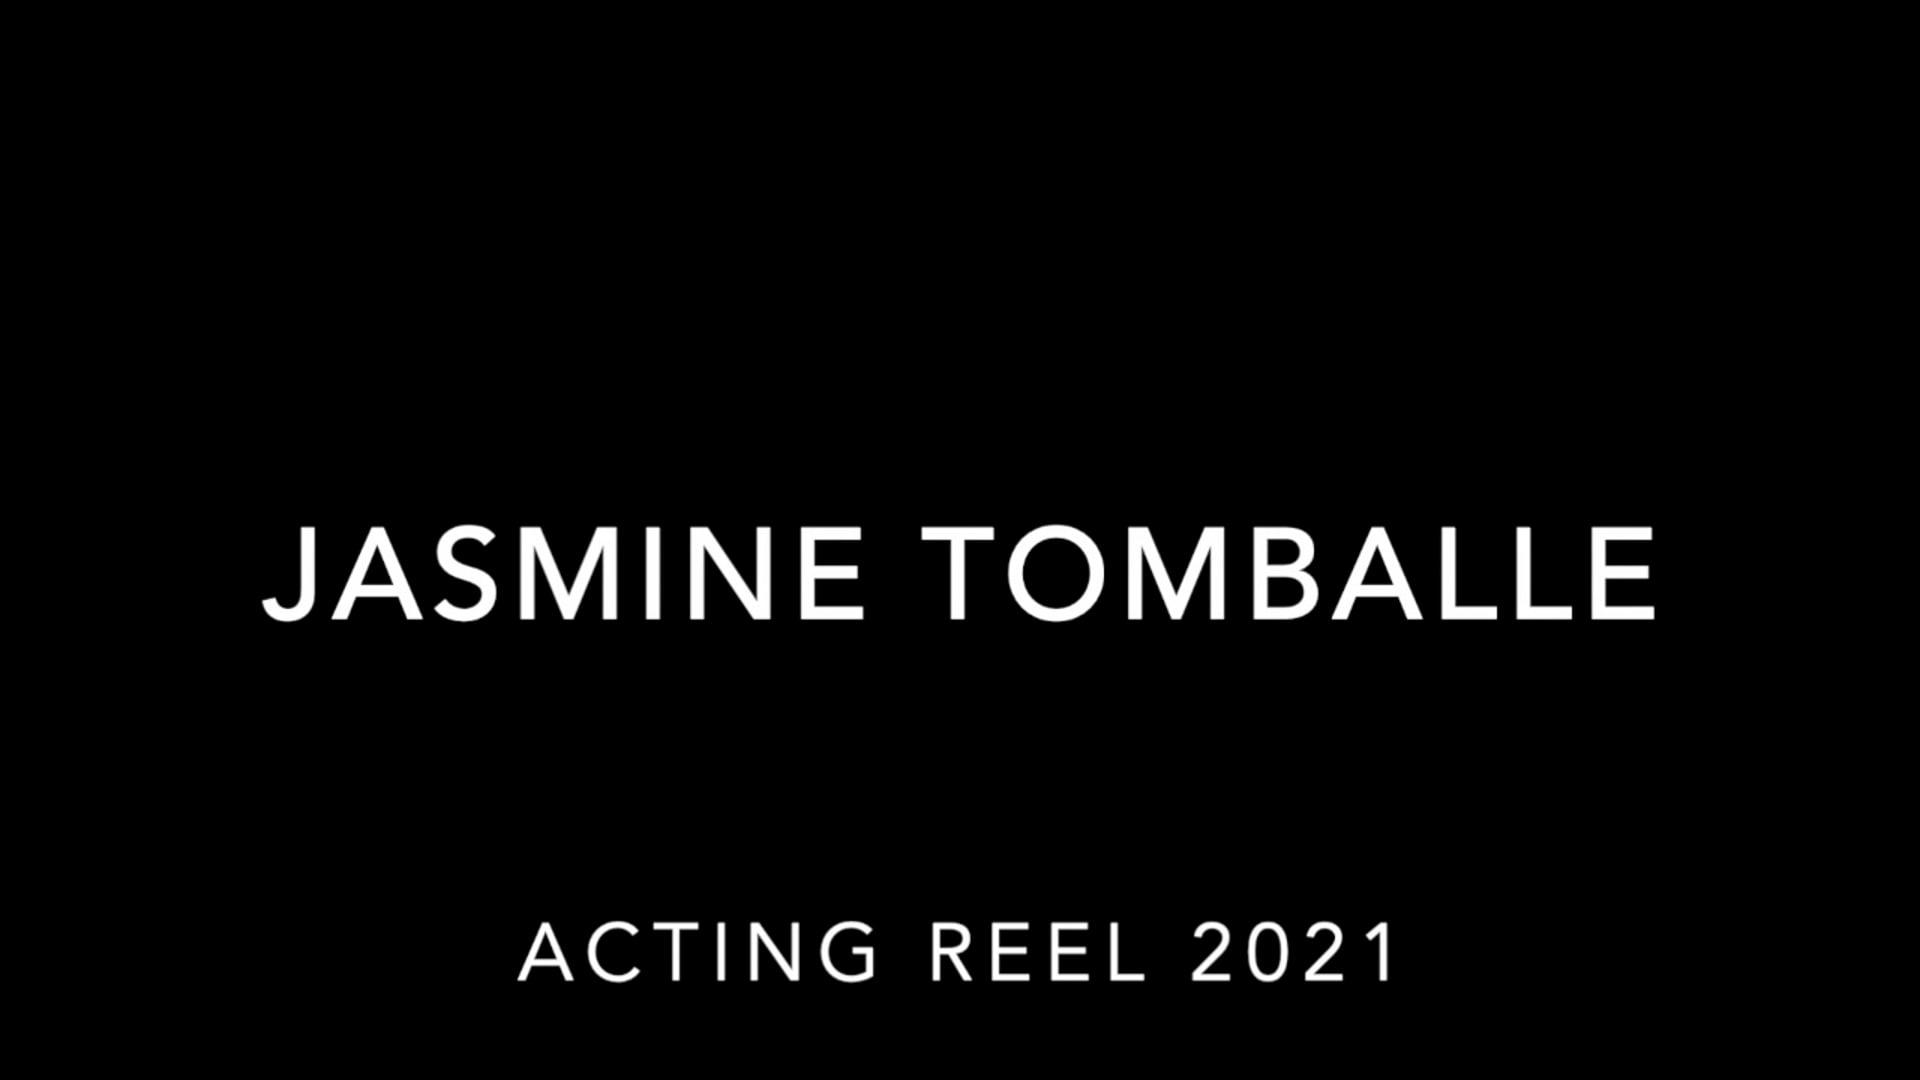 Jasmine Tomballe Acting Reel 2021